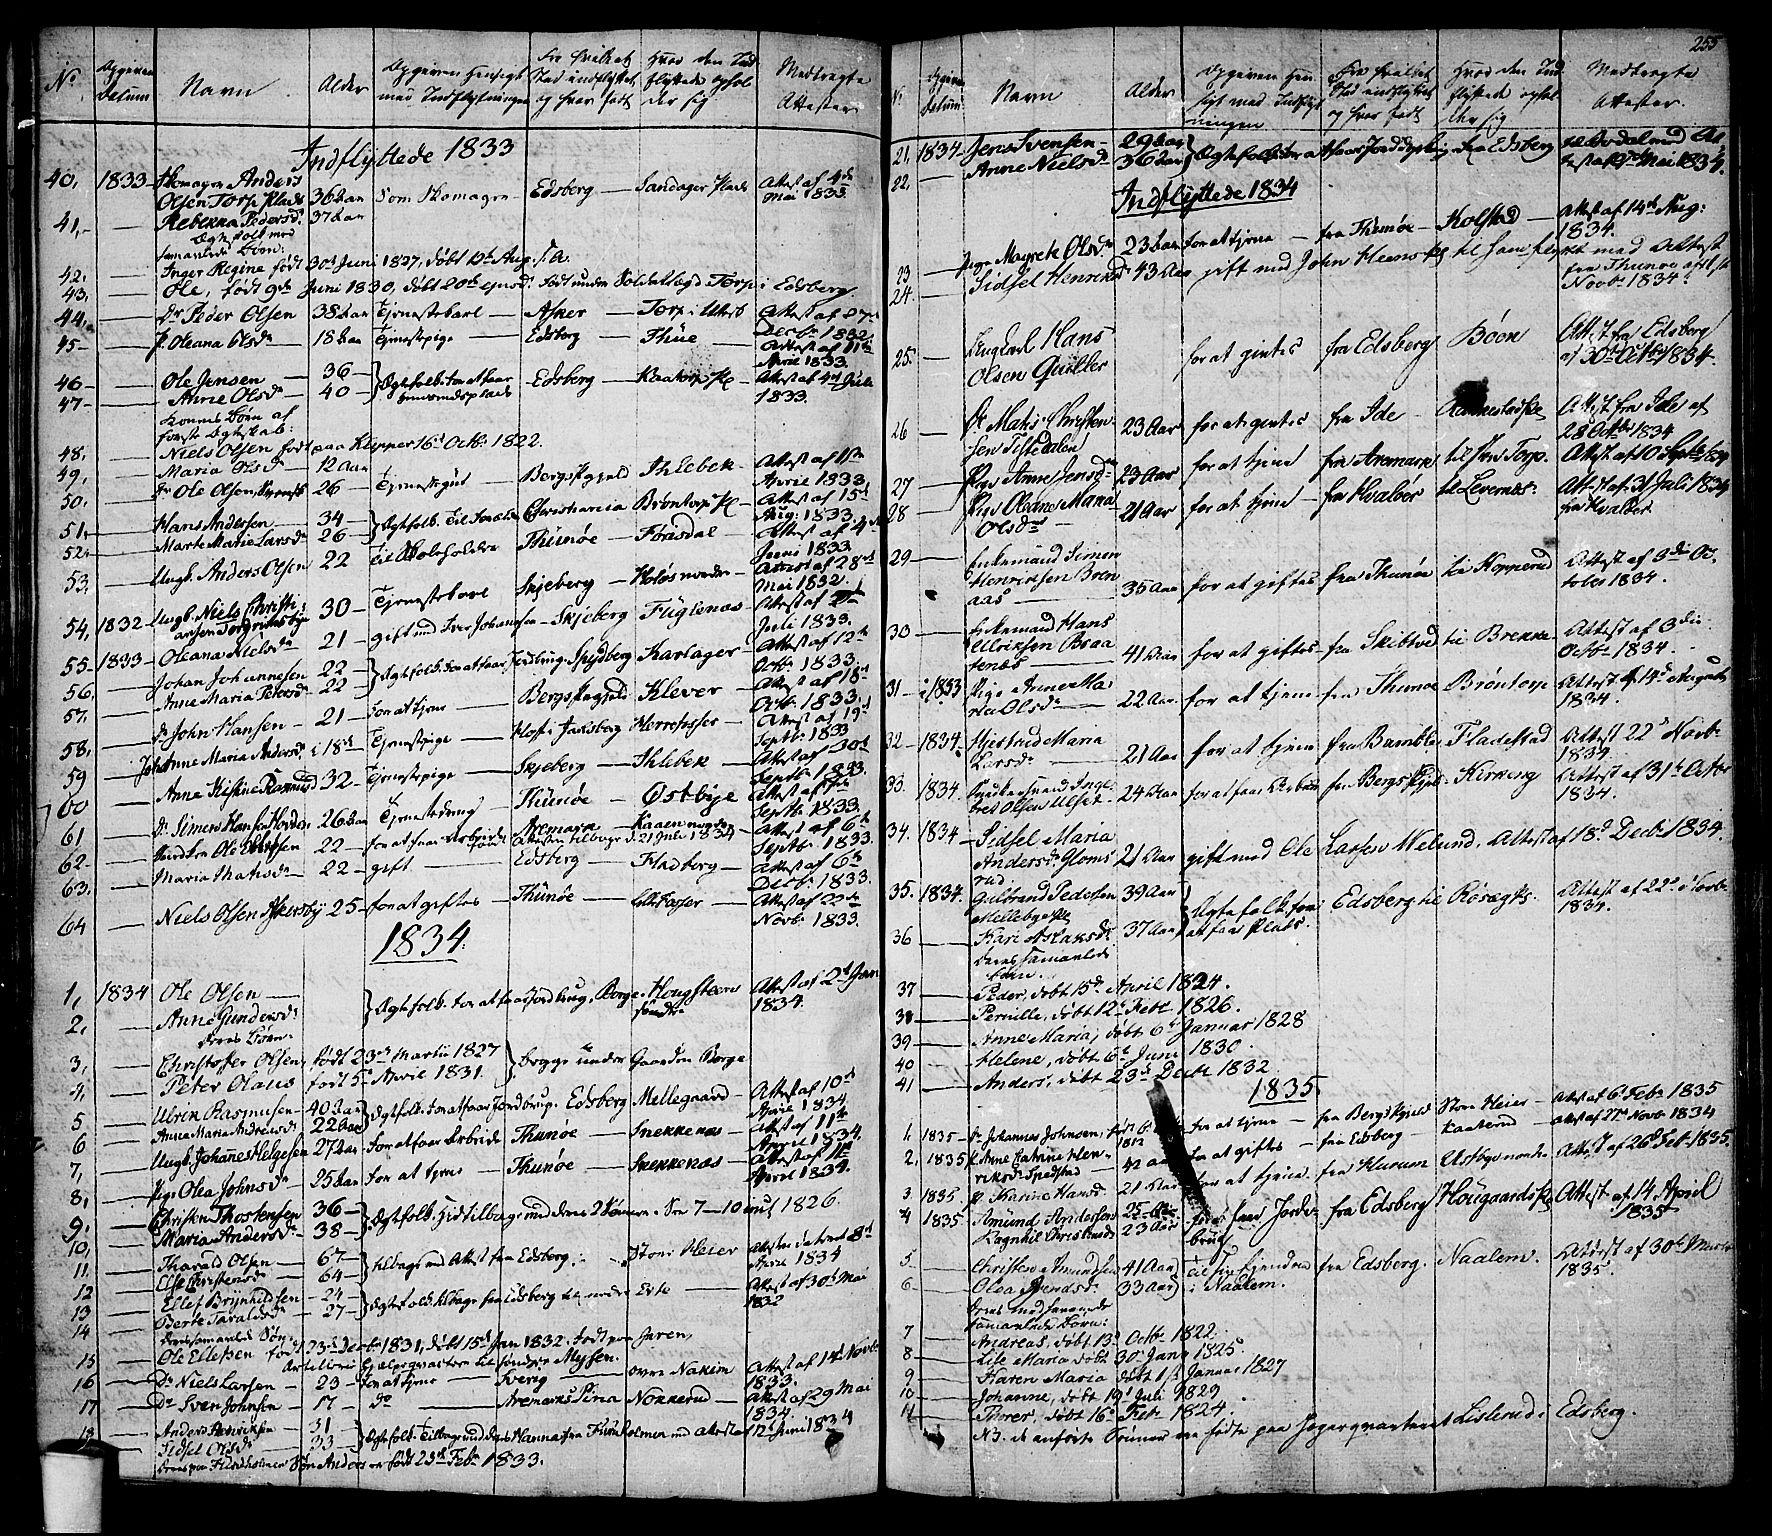 SAO, Rakkestad prestekontor Kirkebøker, F/Fa/L0007: Ministerialbok nr. I 7, 1825-1841, s. 255